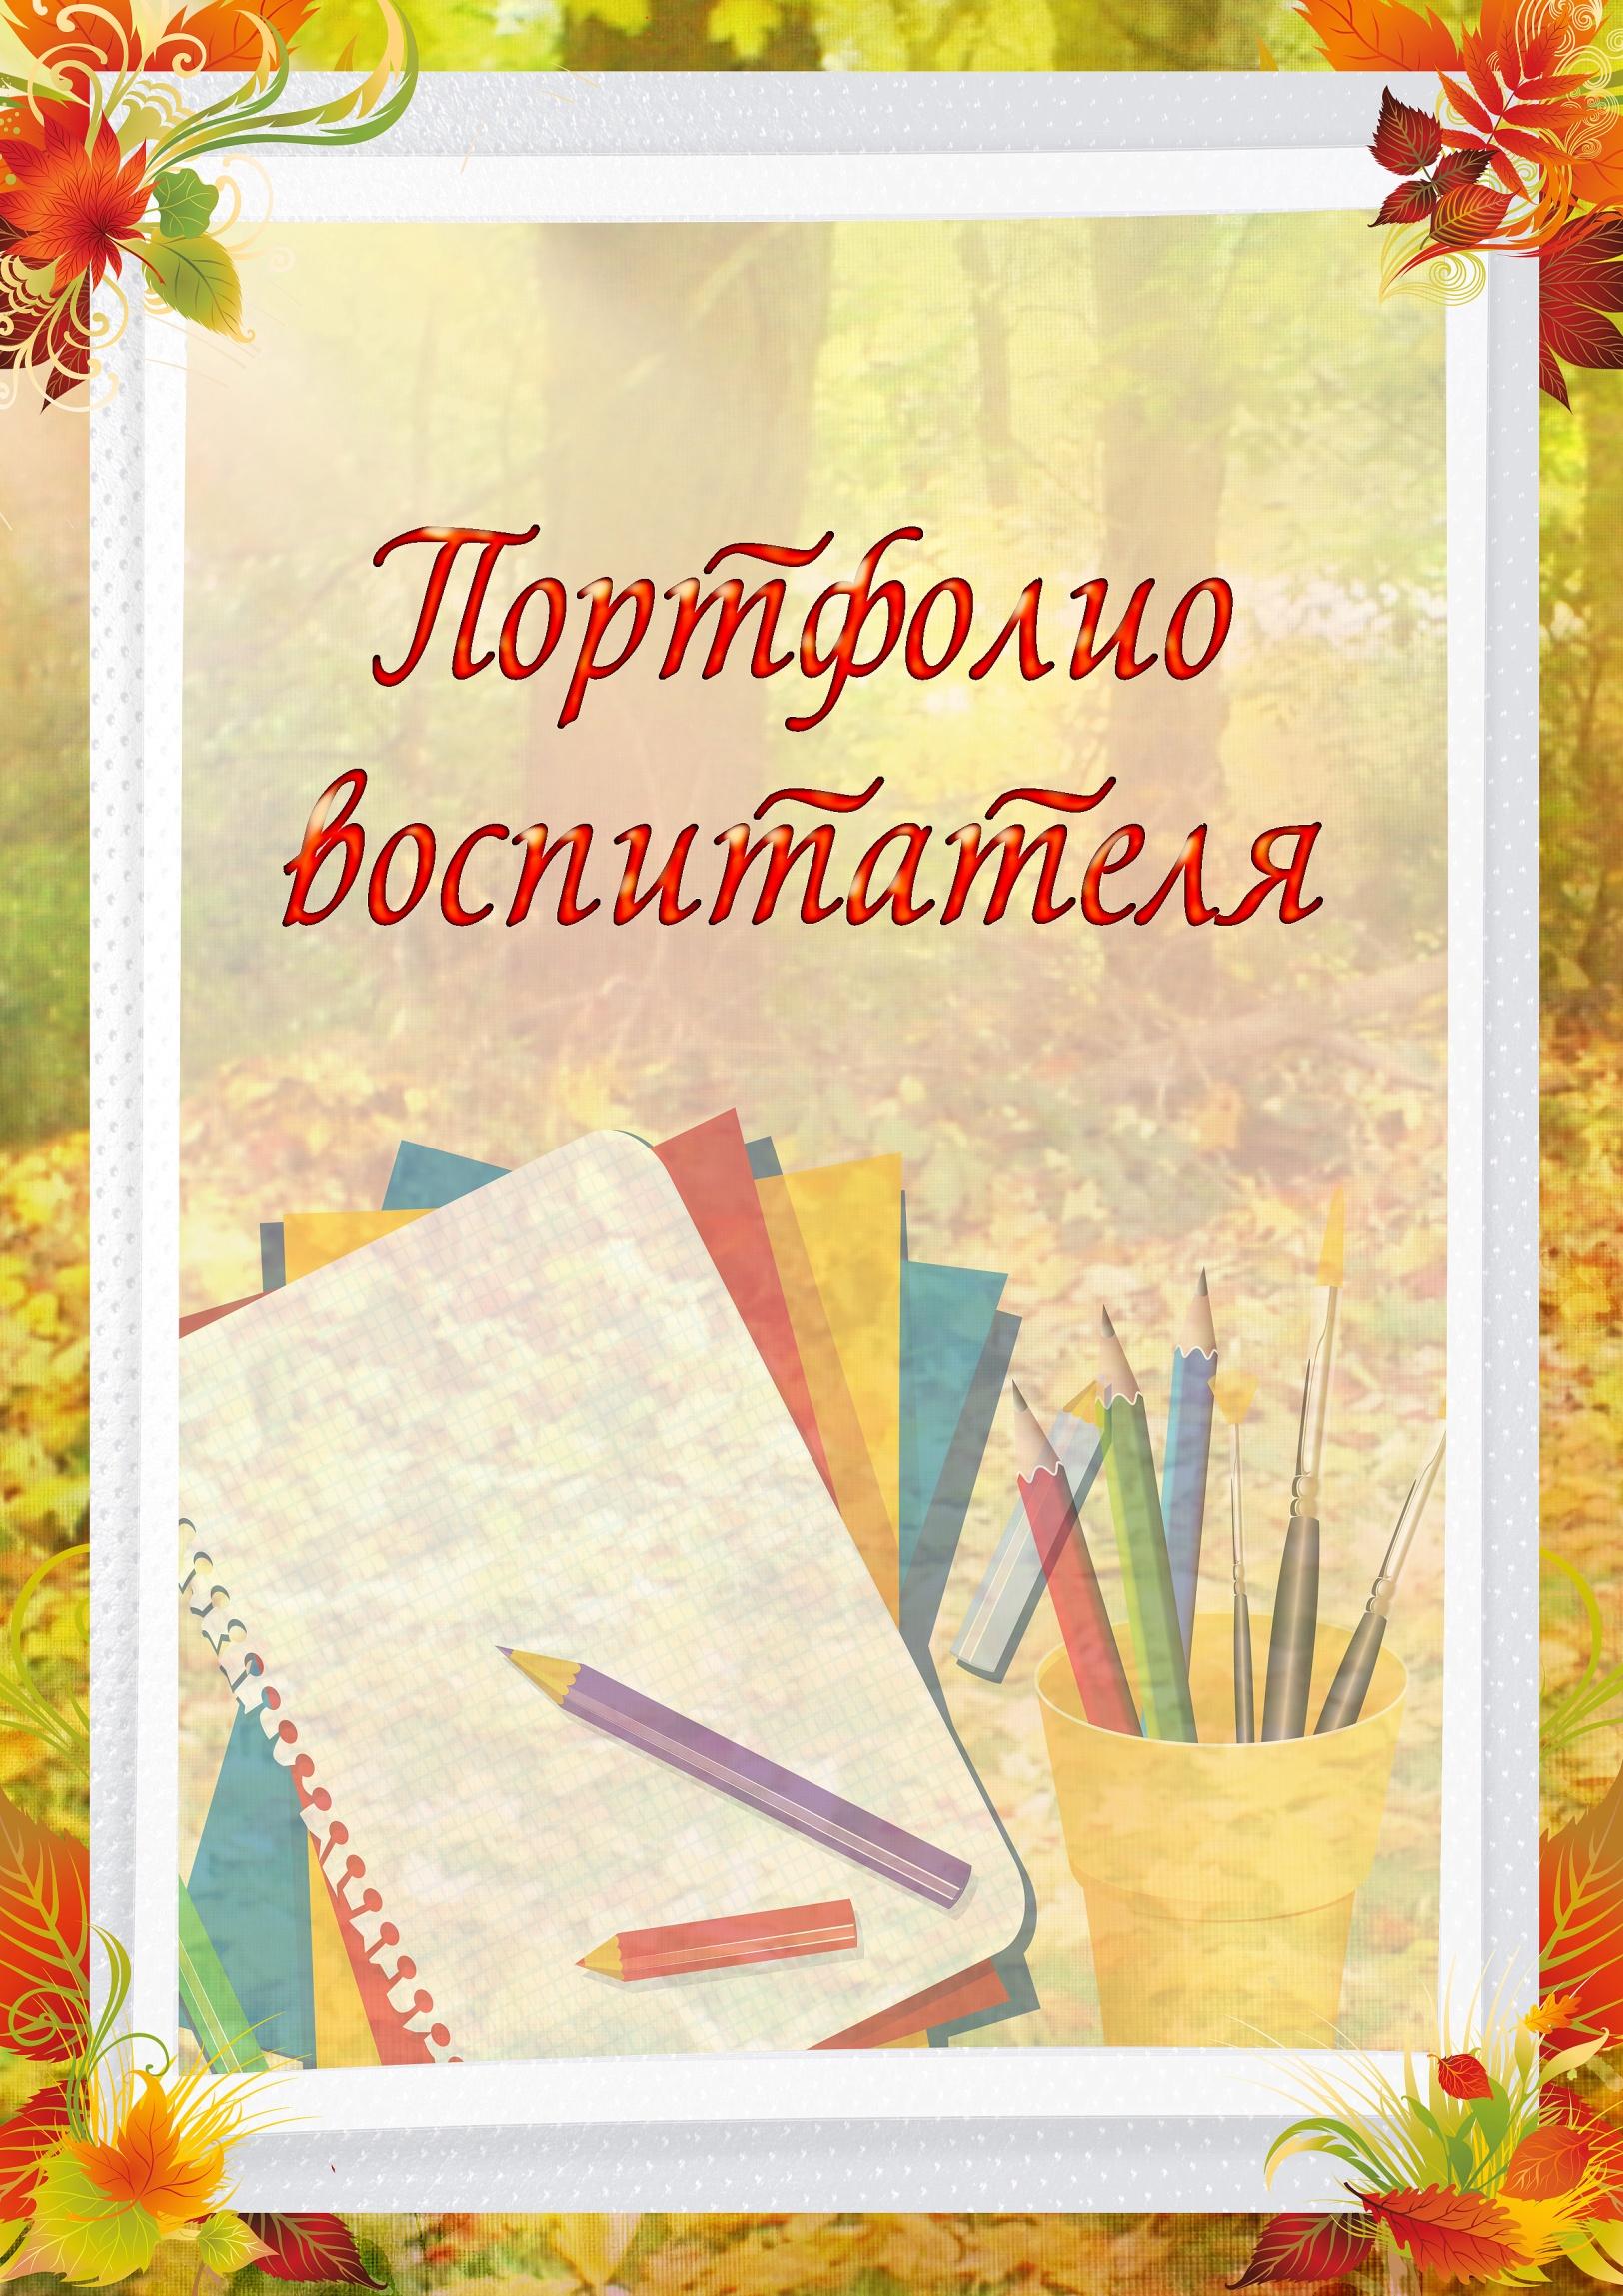 C:\Documents and Settings\Дом\Рабочий стол\portfolio-vospitatelya5\портфолио воспитателя2\1.jpg